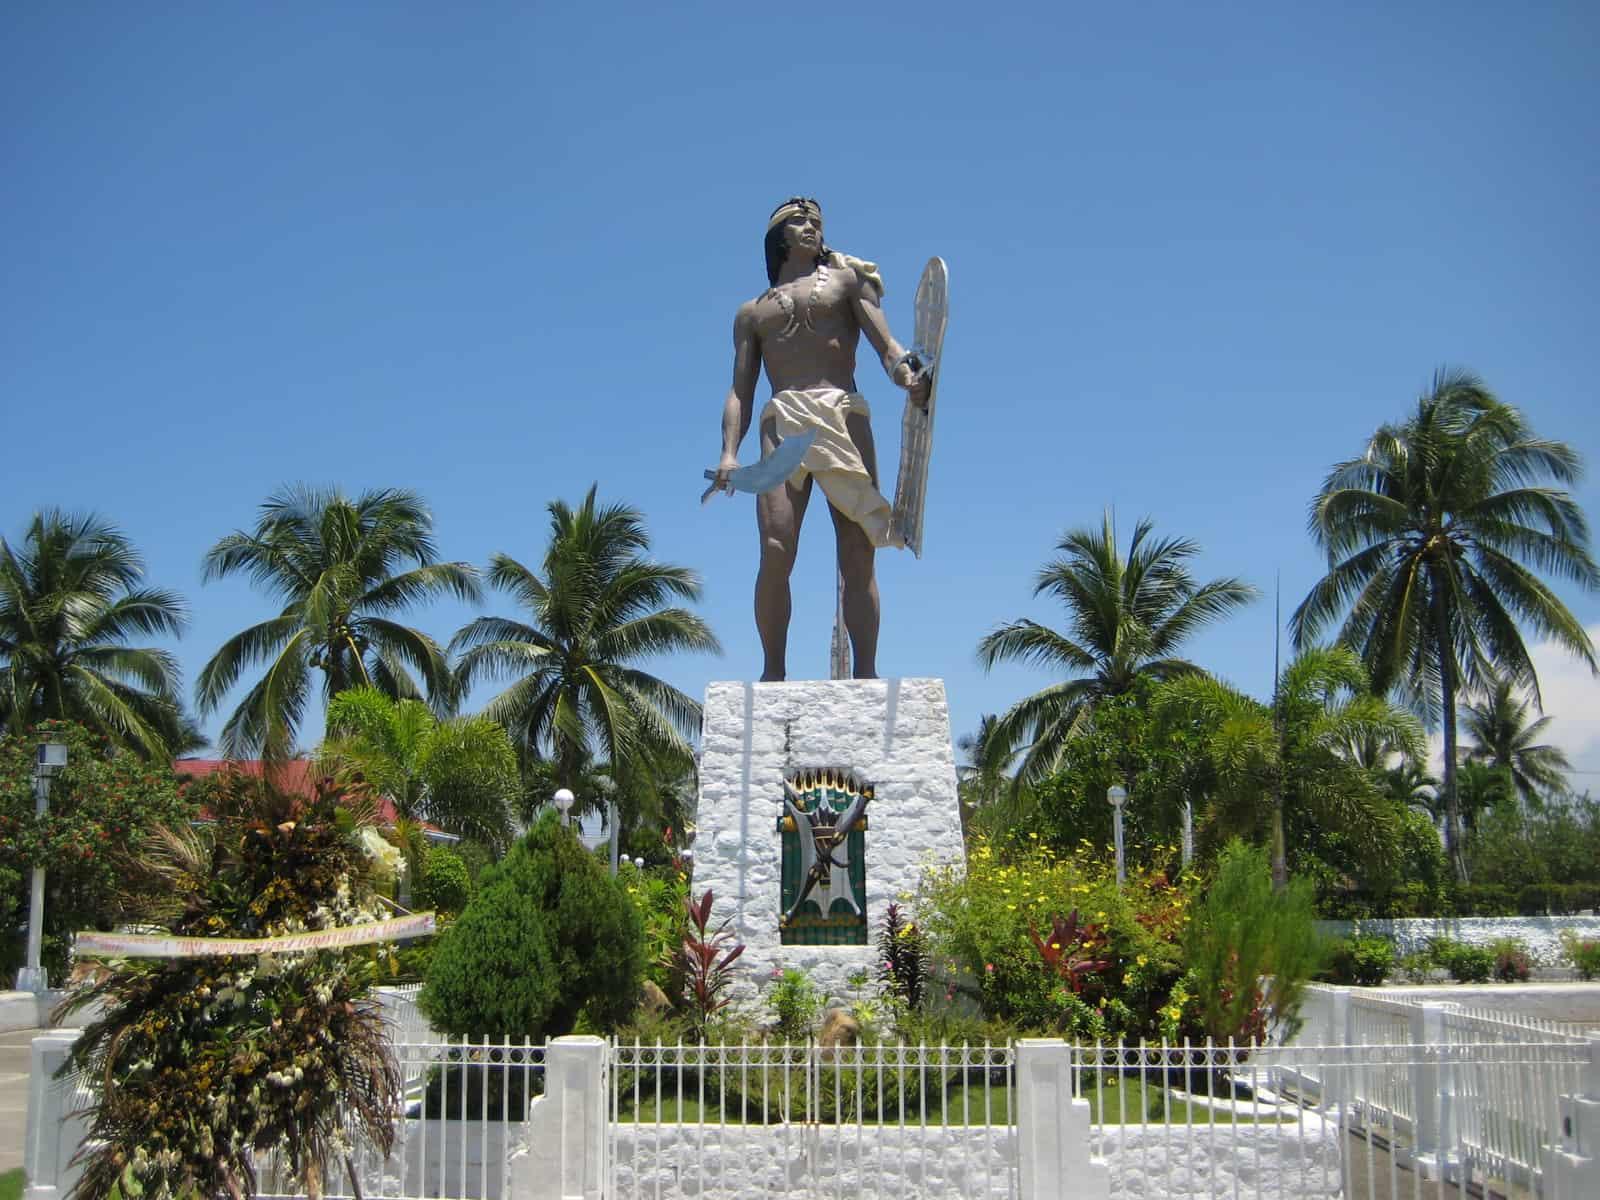 Cebu - Family Destinations in the Philippines